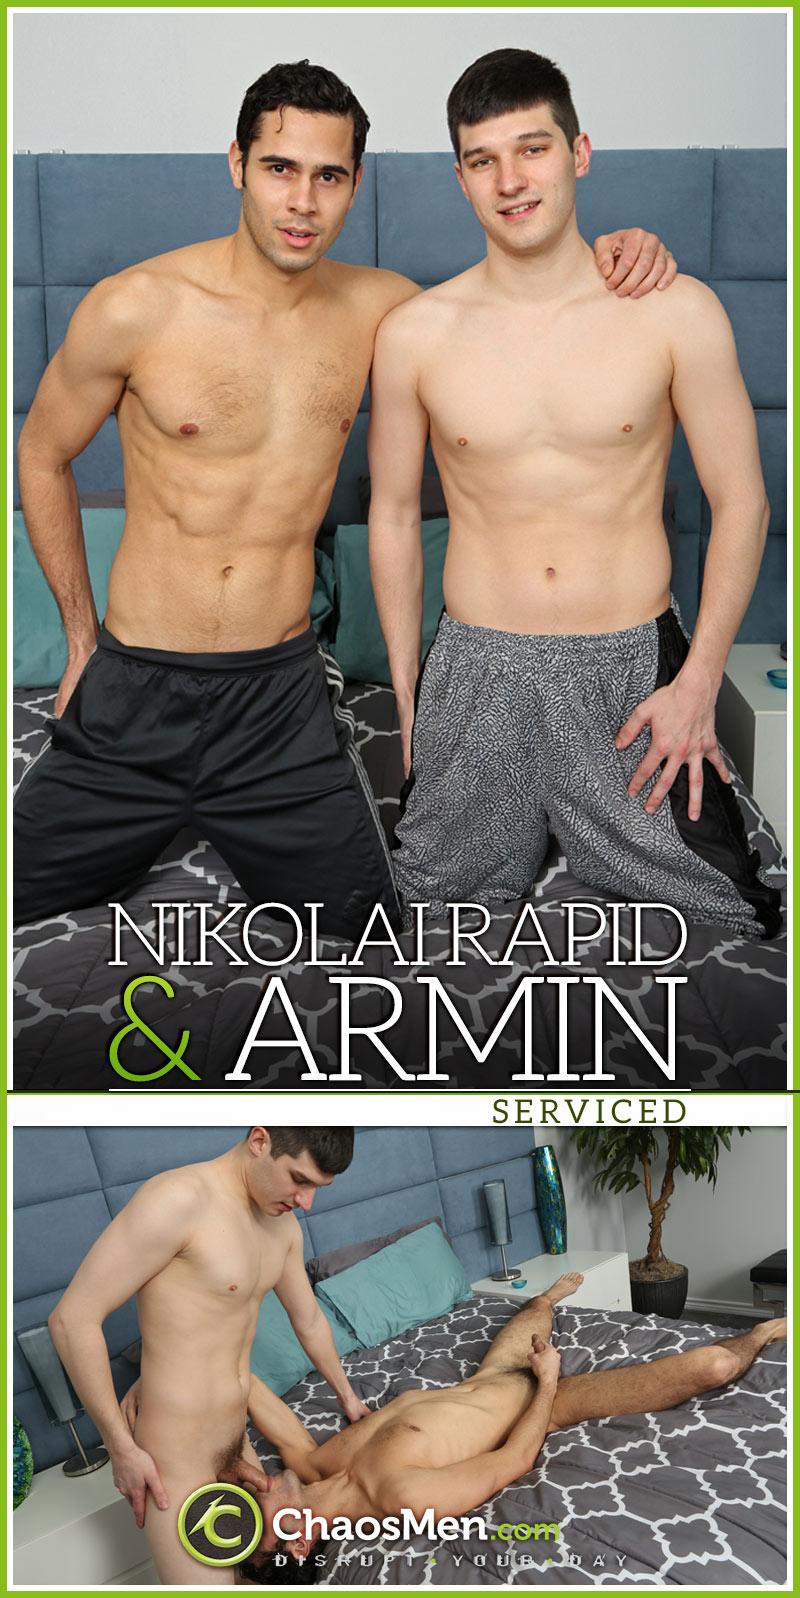 Armin & Nikolai Rapid (Serviced) at ChaosMen